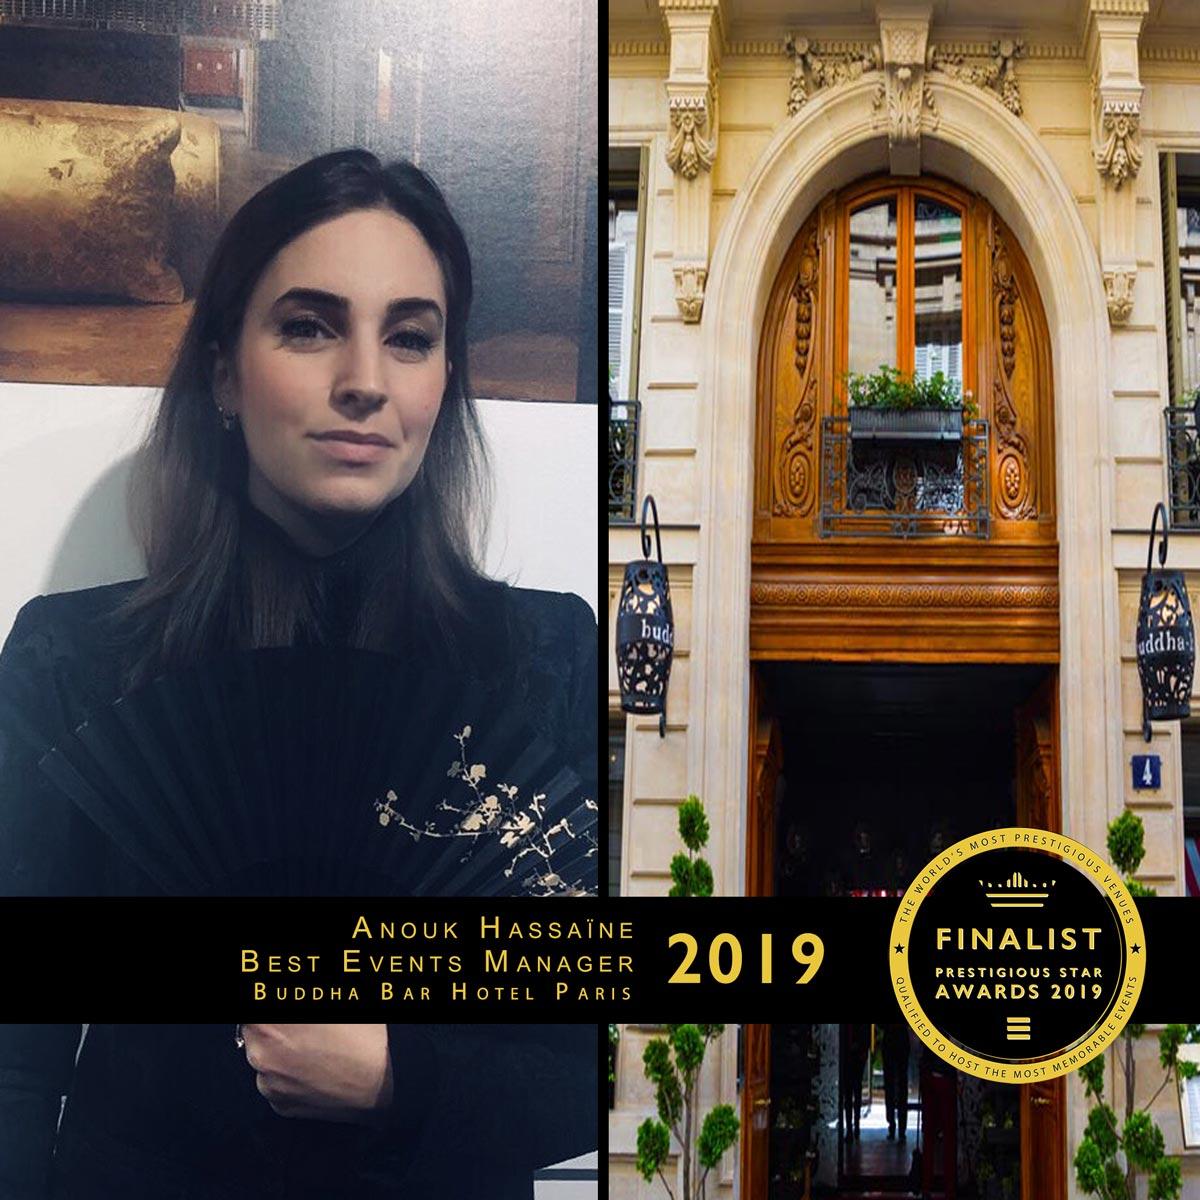 Best-Events-Manager-Finalist-2019-Anouk-Hassaïne-Buddha-Bar-Hotel-Paris-Prestigious-Star-Awards.jpg